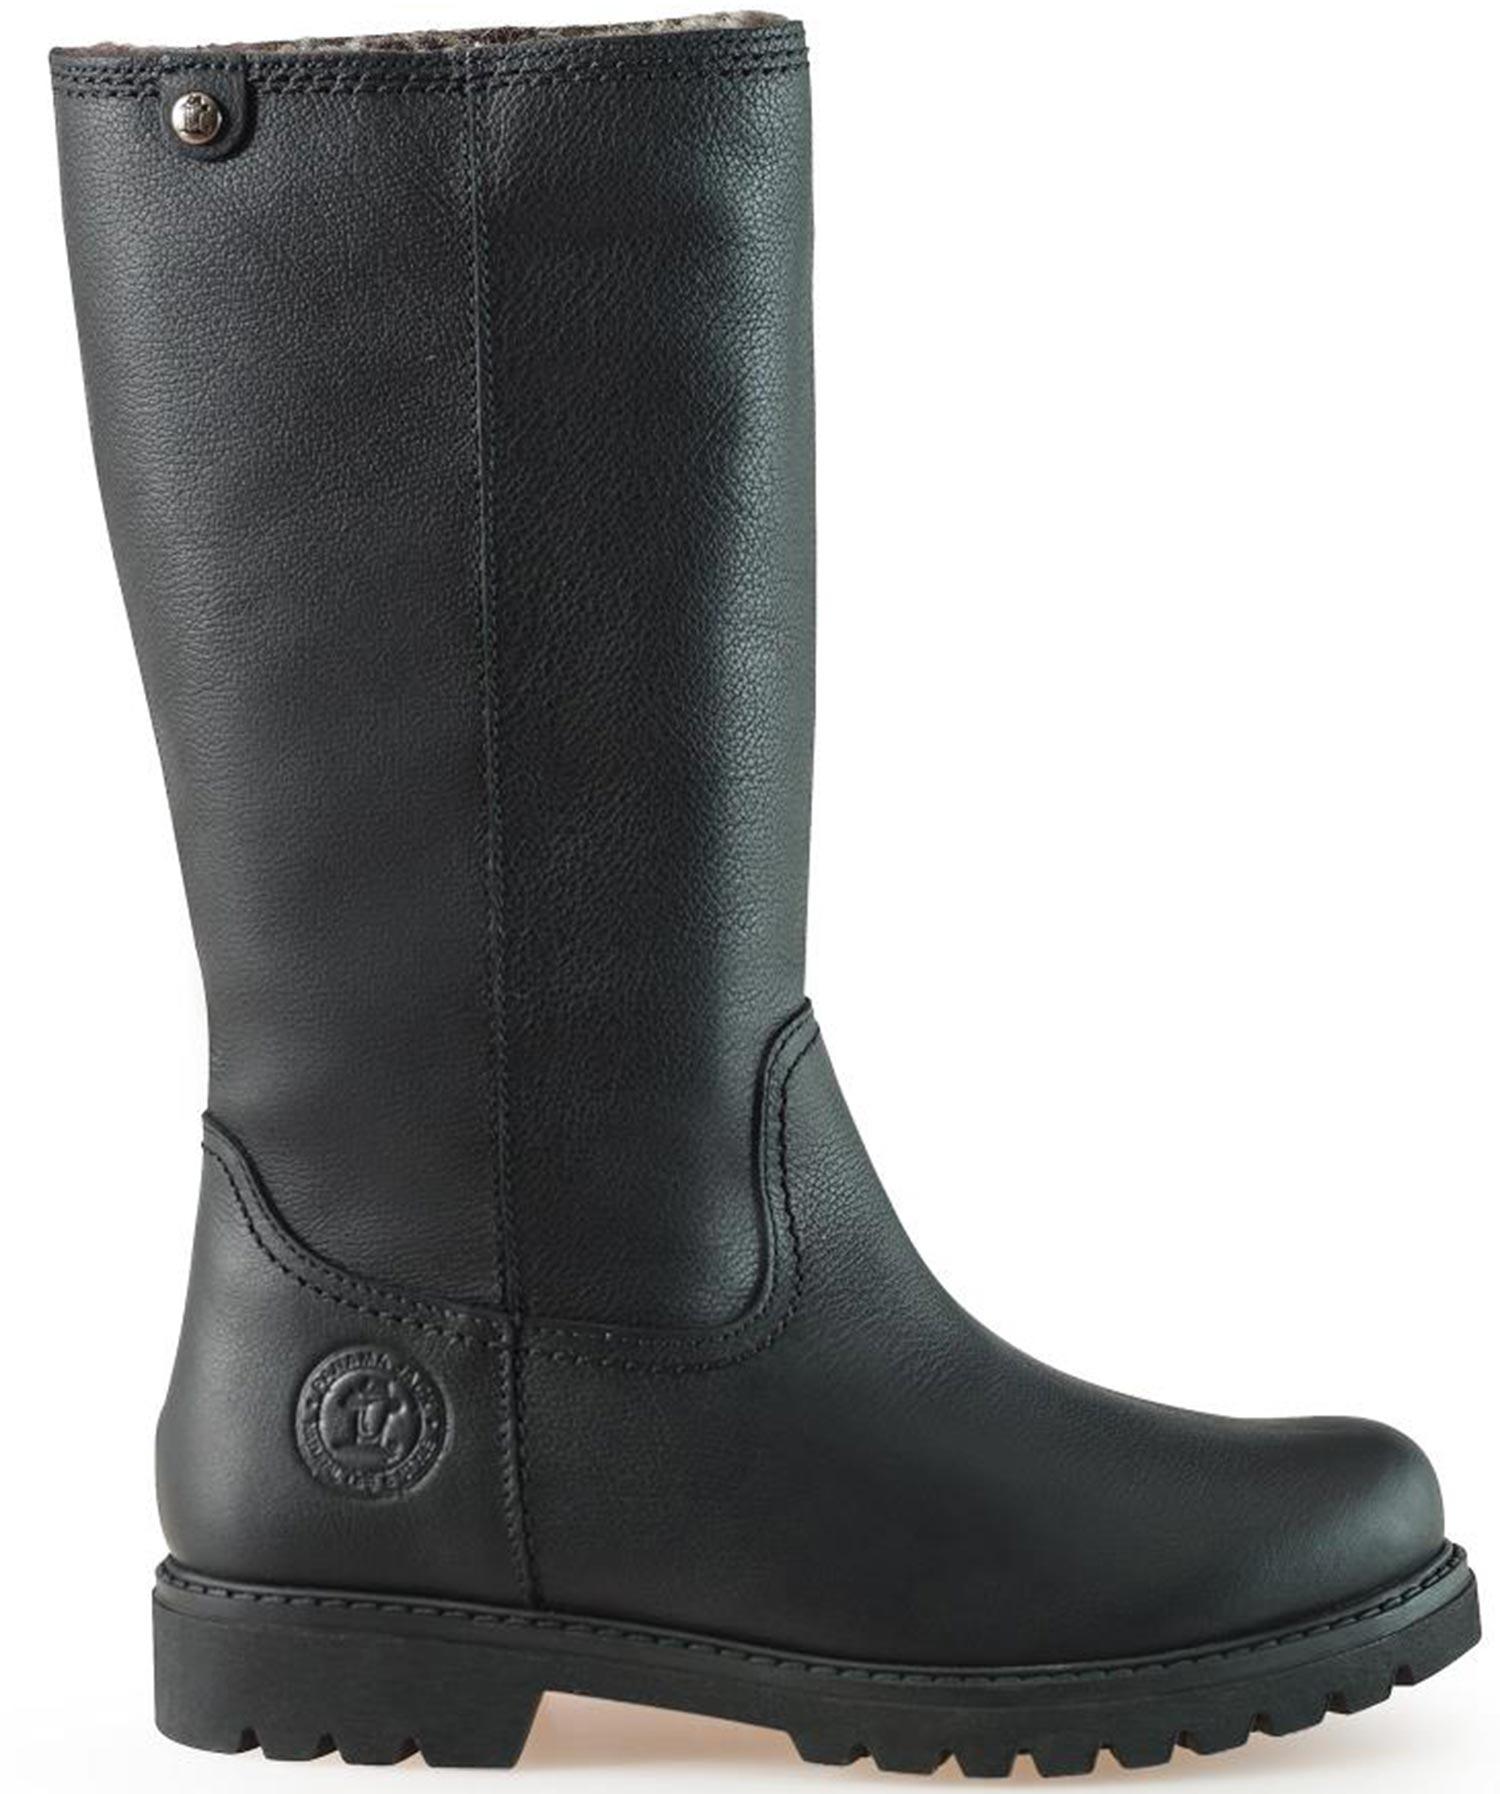 panama jack bambina b60 stiefel boots winterstiefel. Black Bedroom Furniture Sets. Home Design Ideas